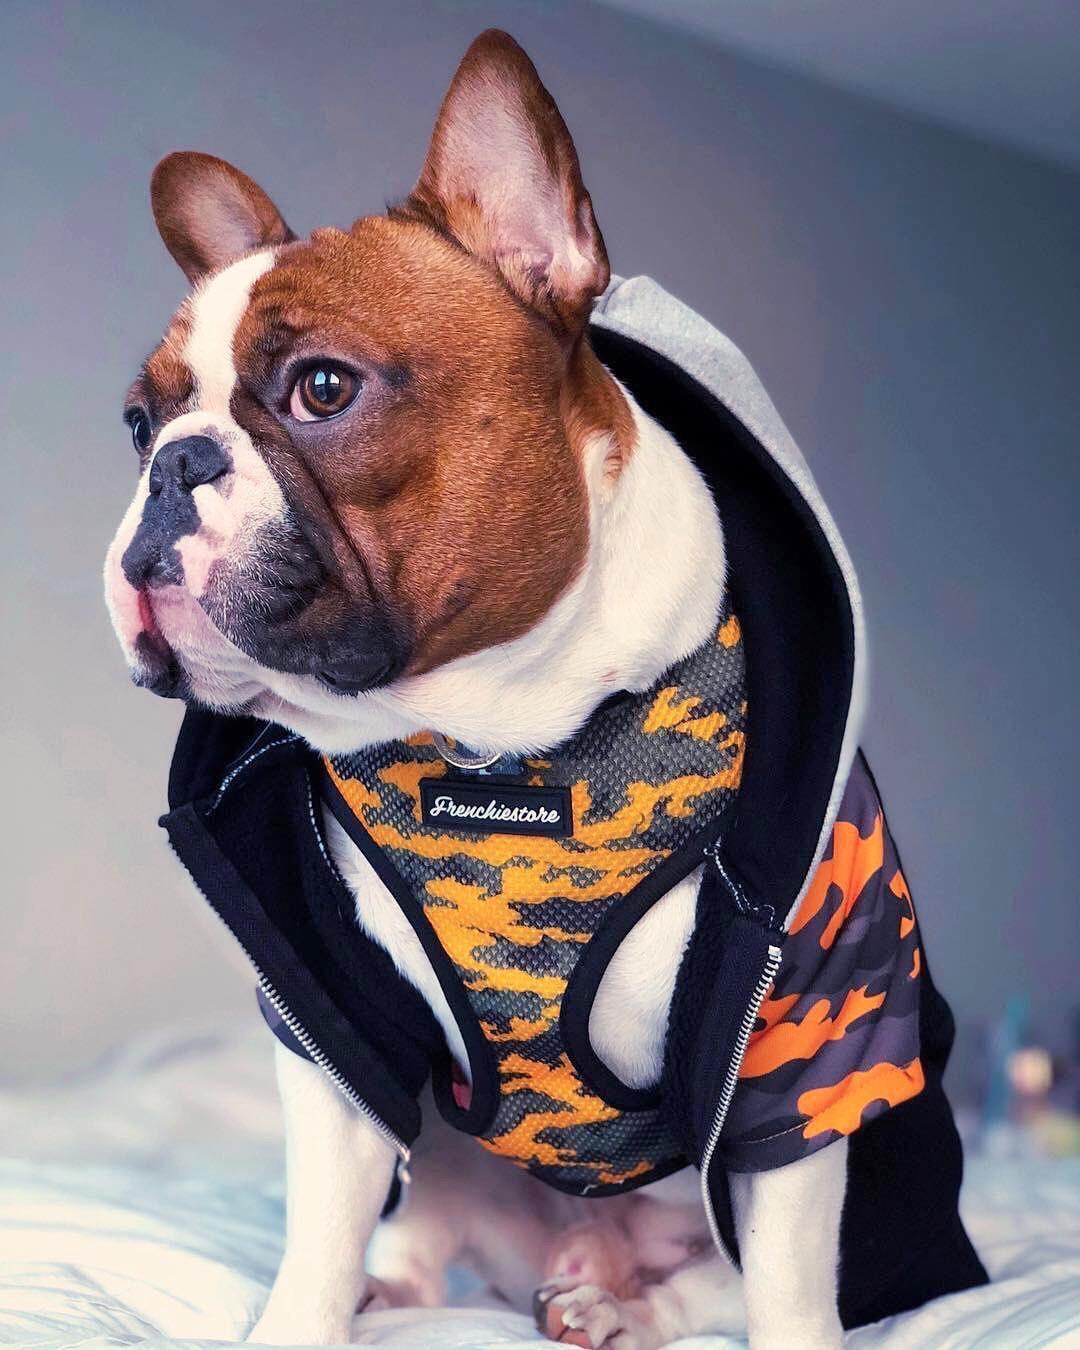 French Bulldog Financing : french, bulldog, financing, French, Bulldog, Puppy, Budget